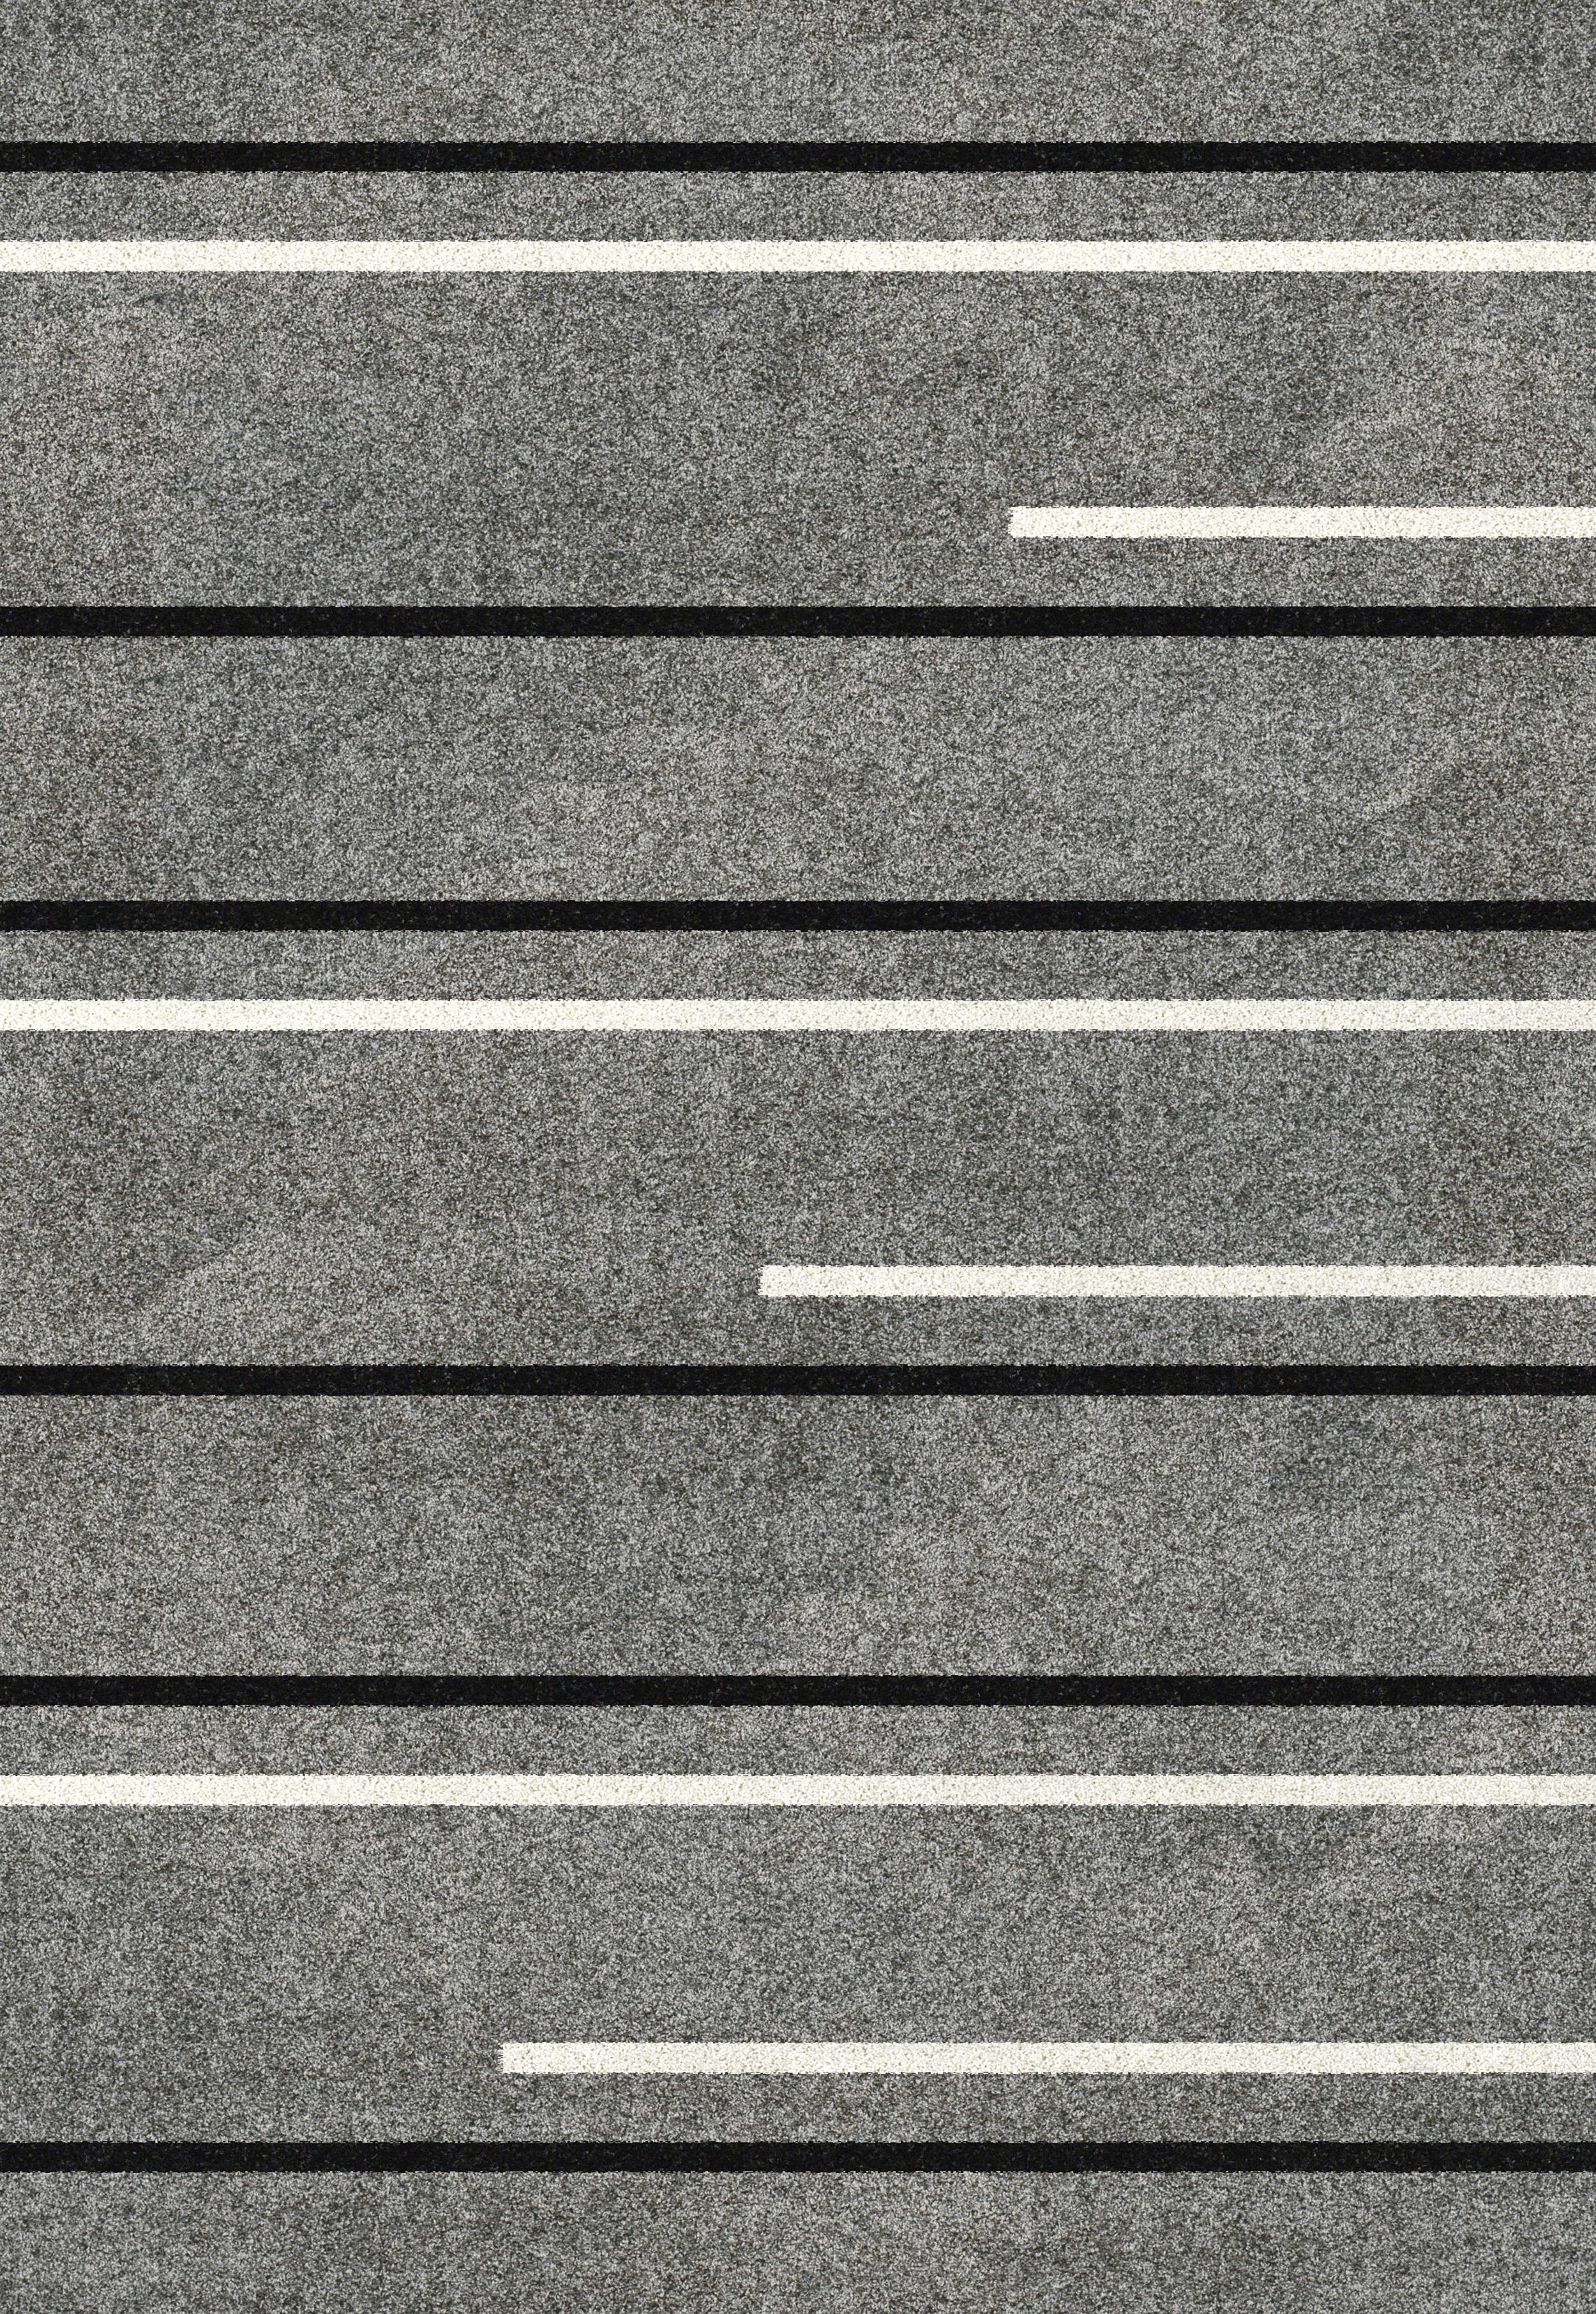 best modern carpets modern carpet texture. this area rug is a contemporary design modern carpet YYCJDVN